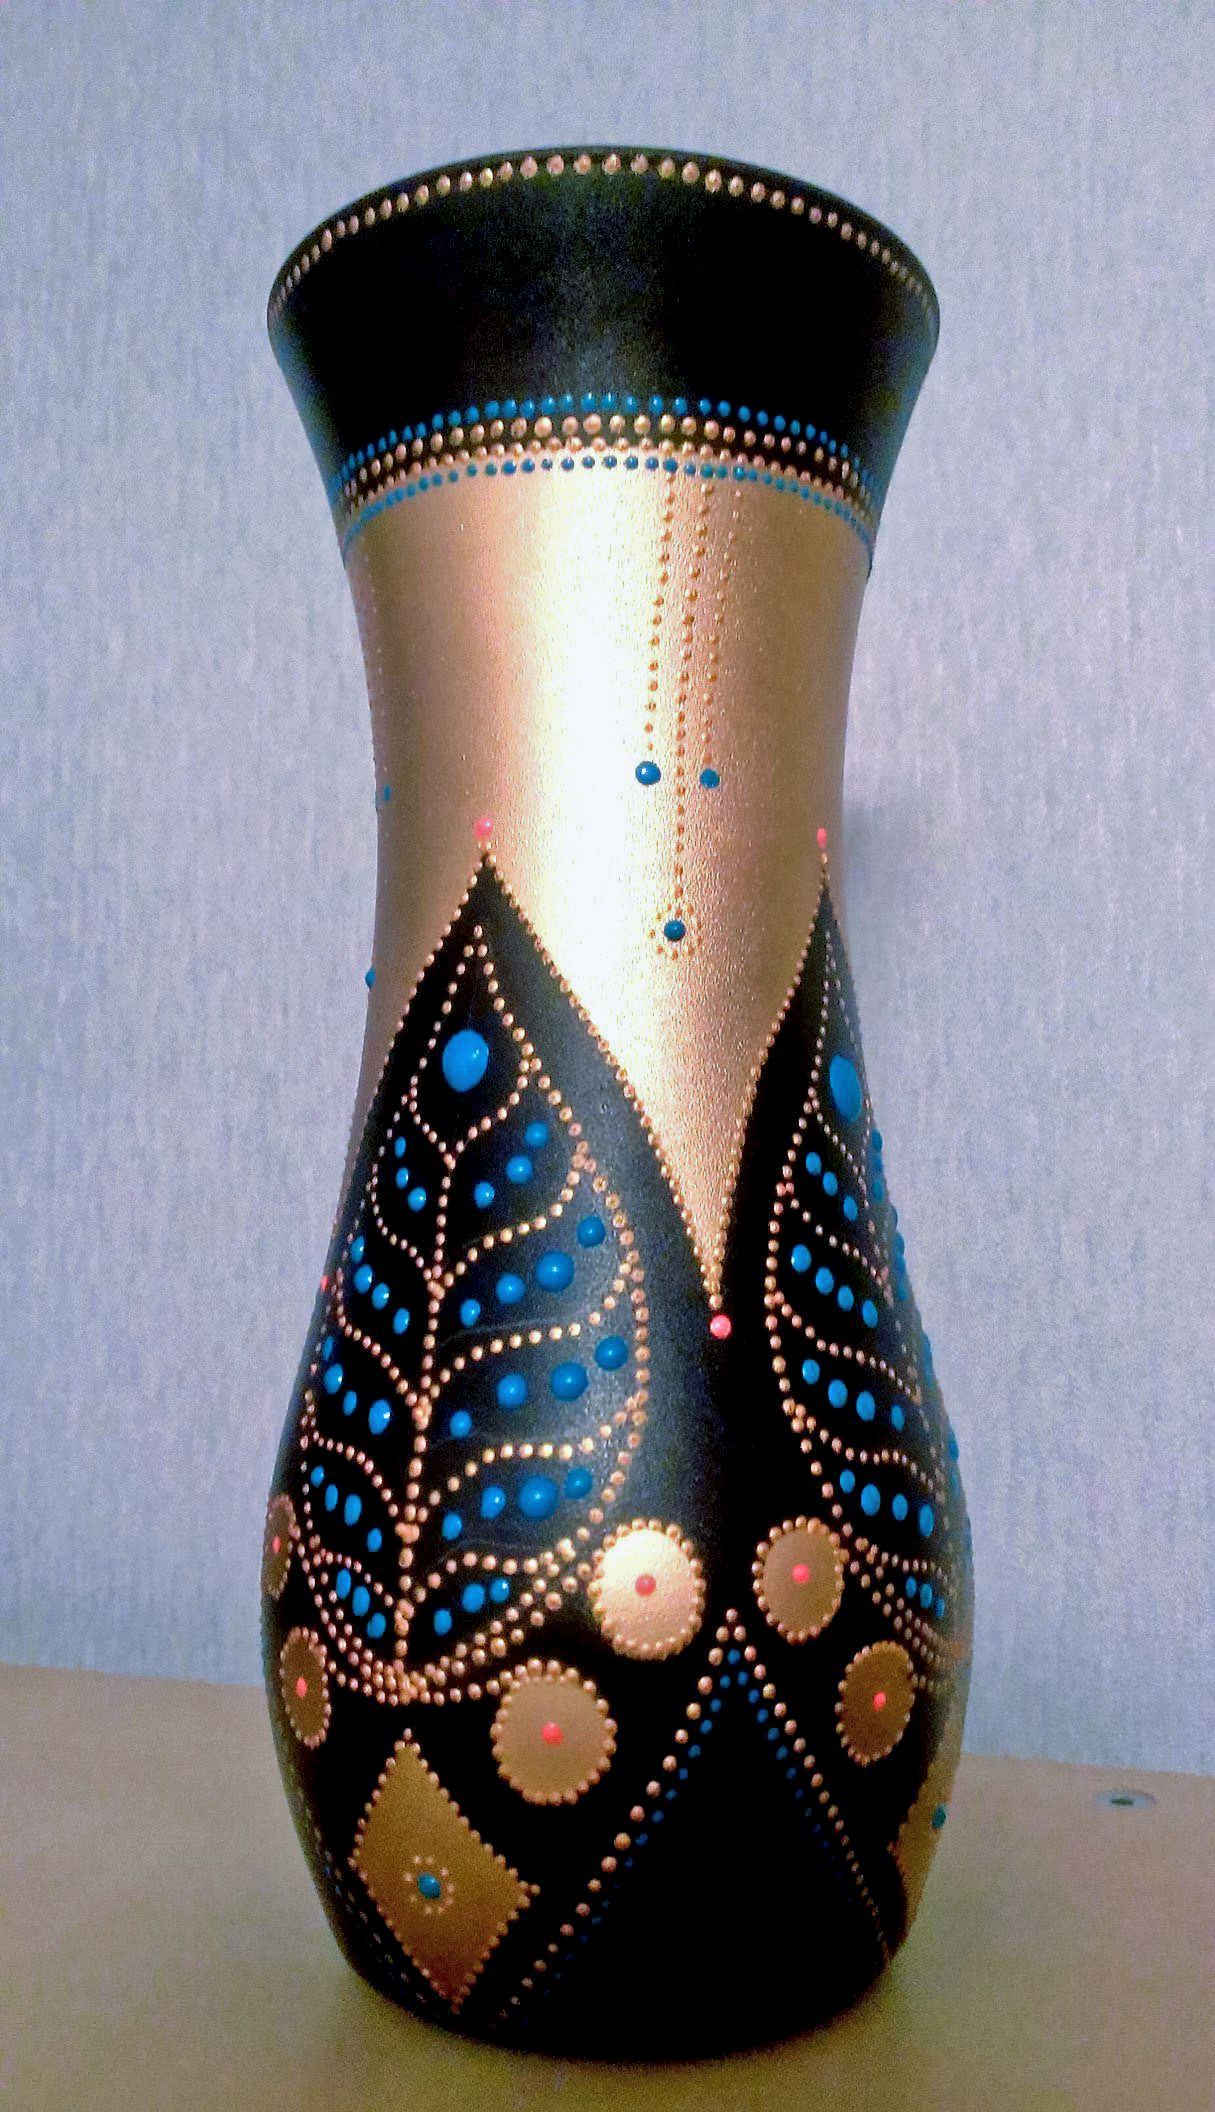 ручнаяработа подарок декор точечнаяроспись ваза handmade узоры медовыйсад декоративнаяваза цветы